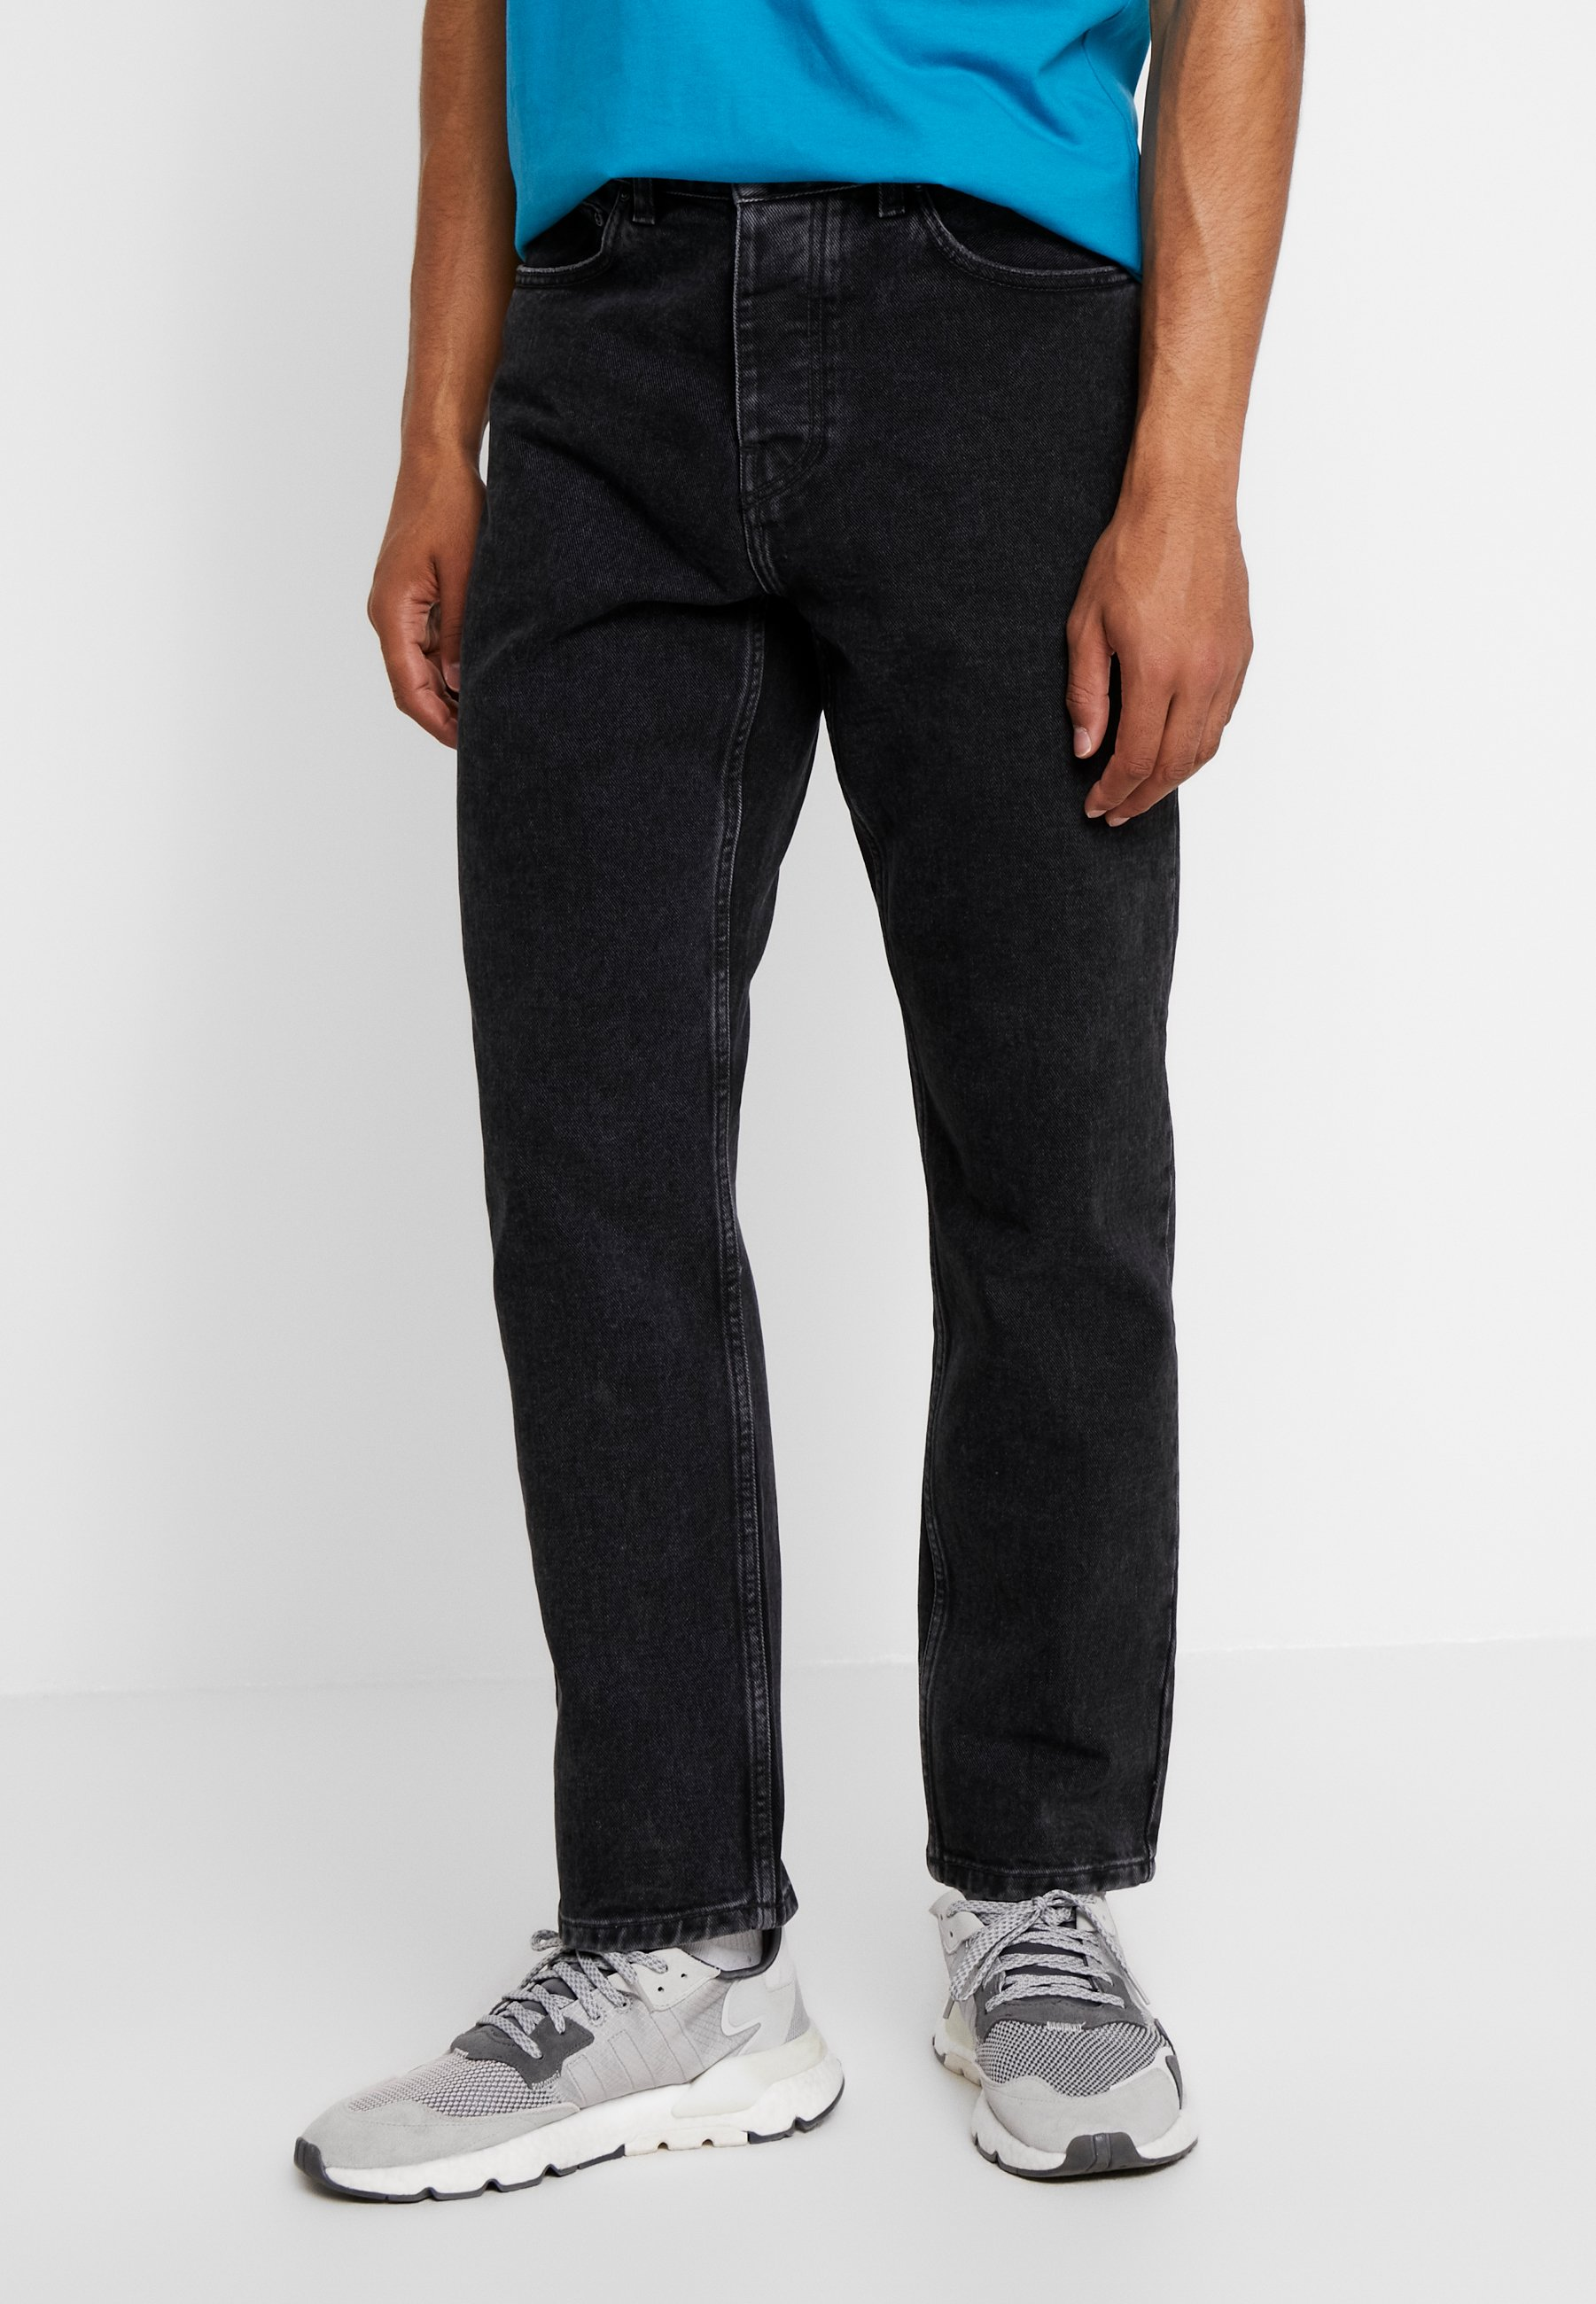 Carhartt Wip Newel Stone MaitlandJean Black Washed Pant Boyfriend nXOPN8k0w